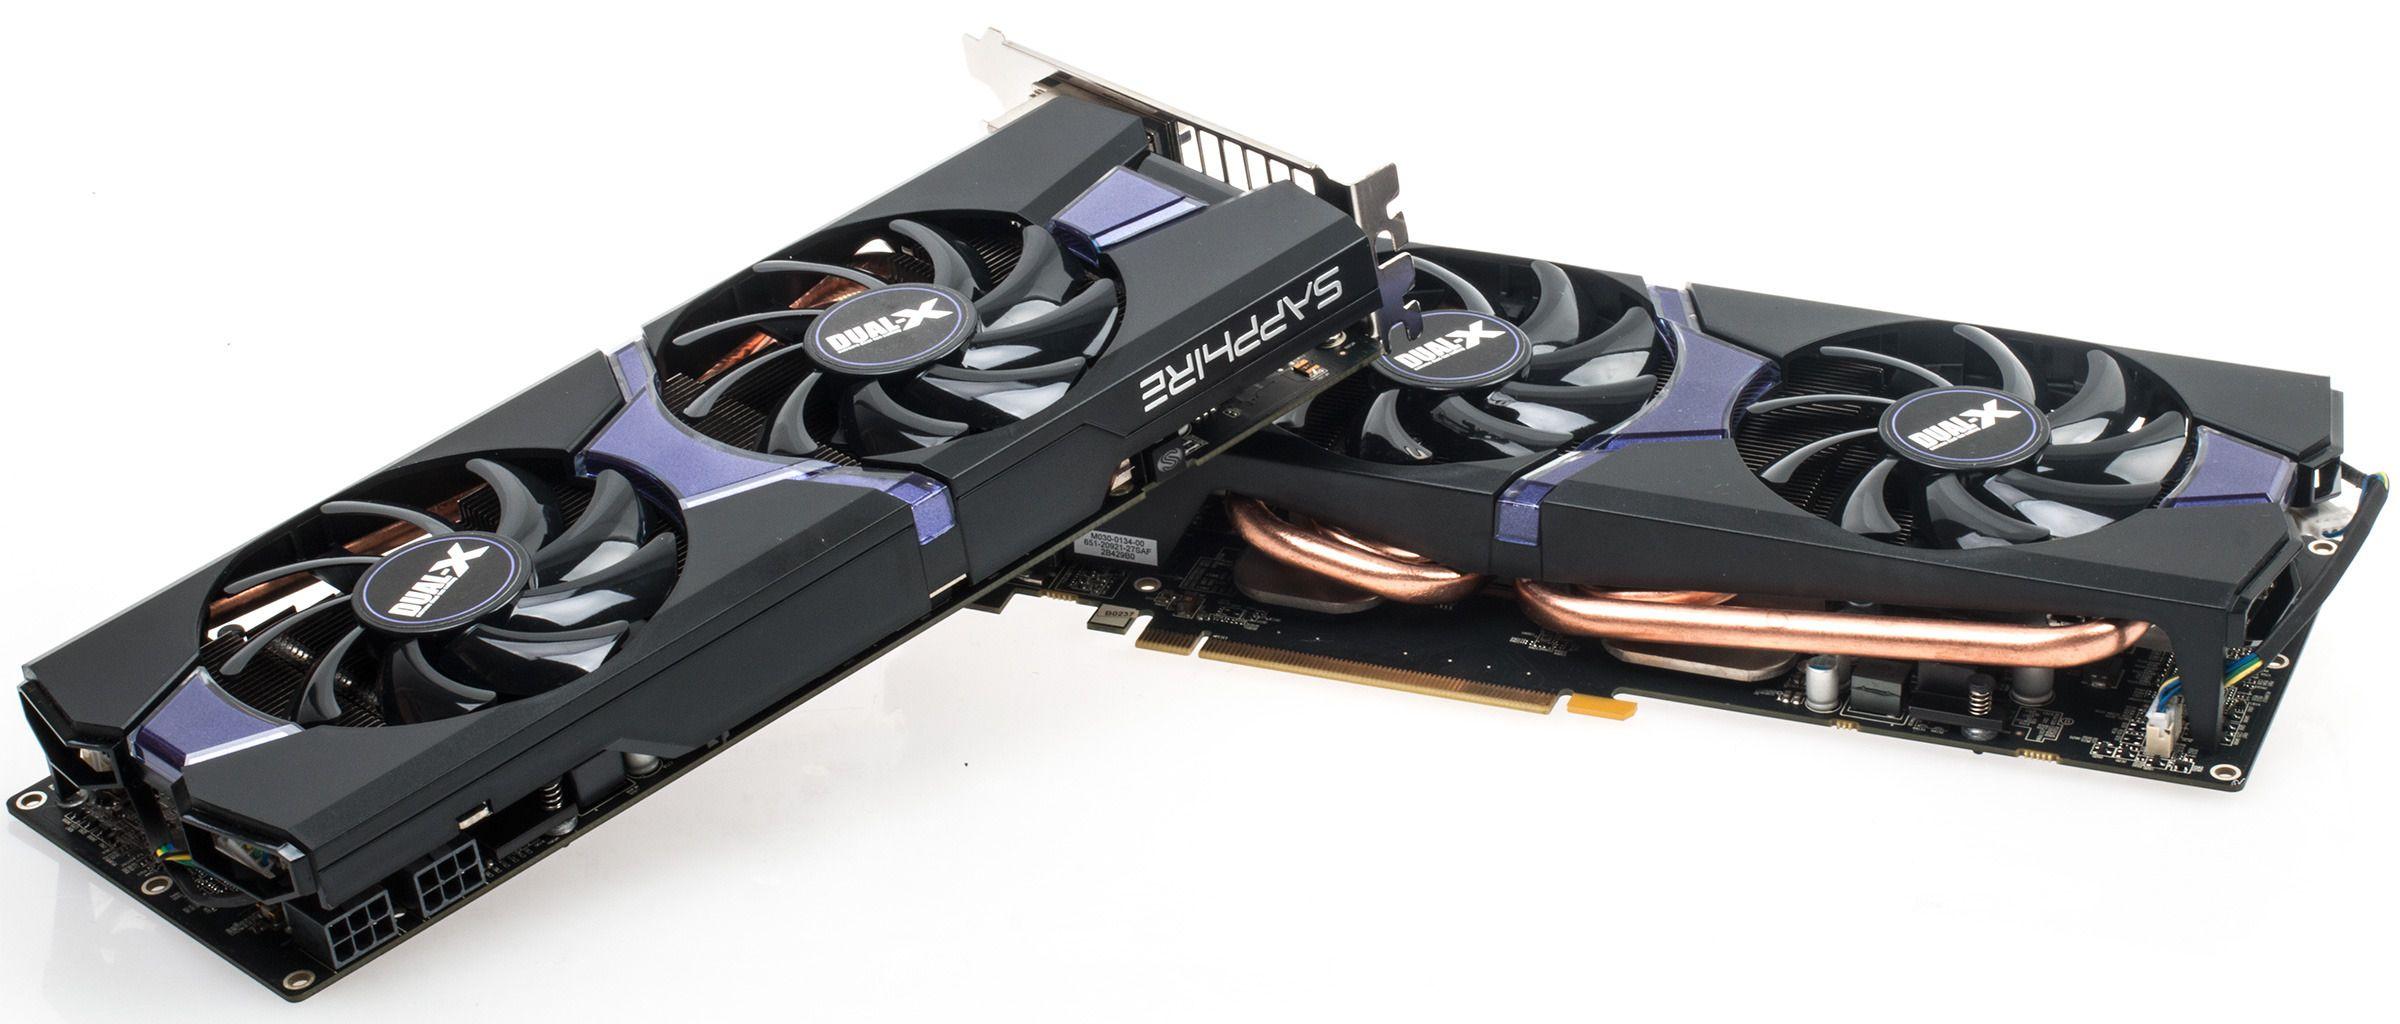 Sapphire Radeon R9 285 OC Dual-X Crossfire.Foto: Varg Aamo, Tek.no